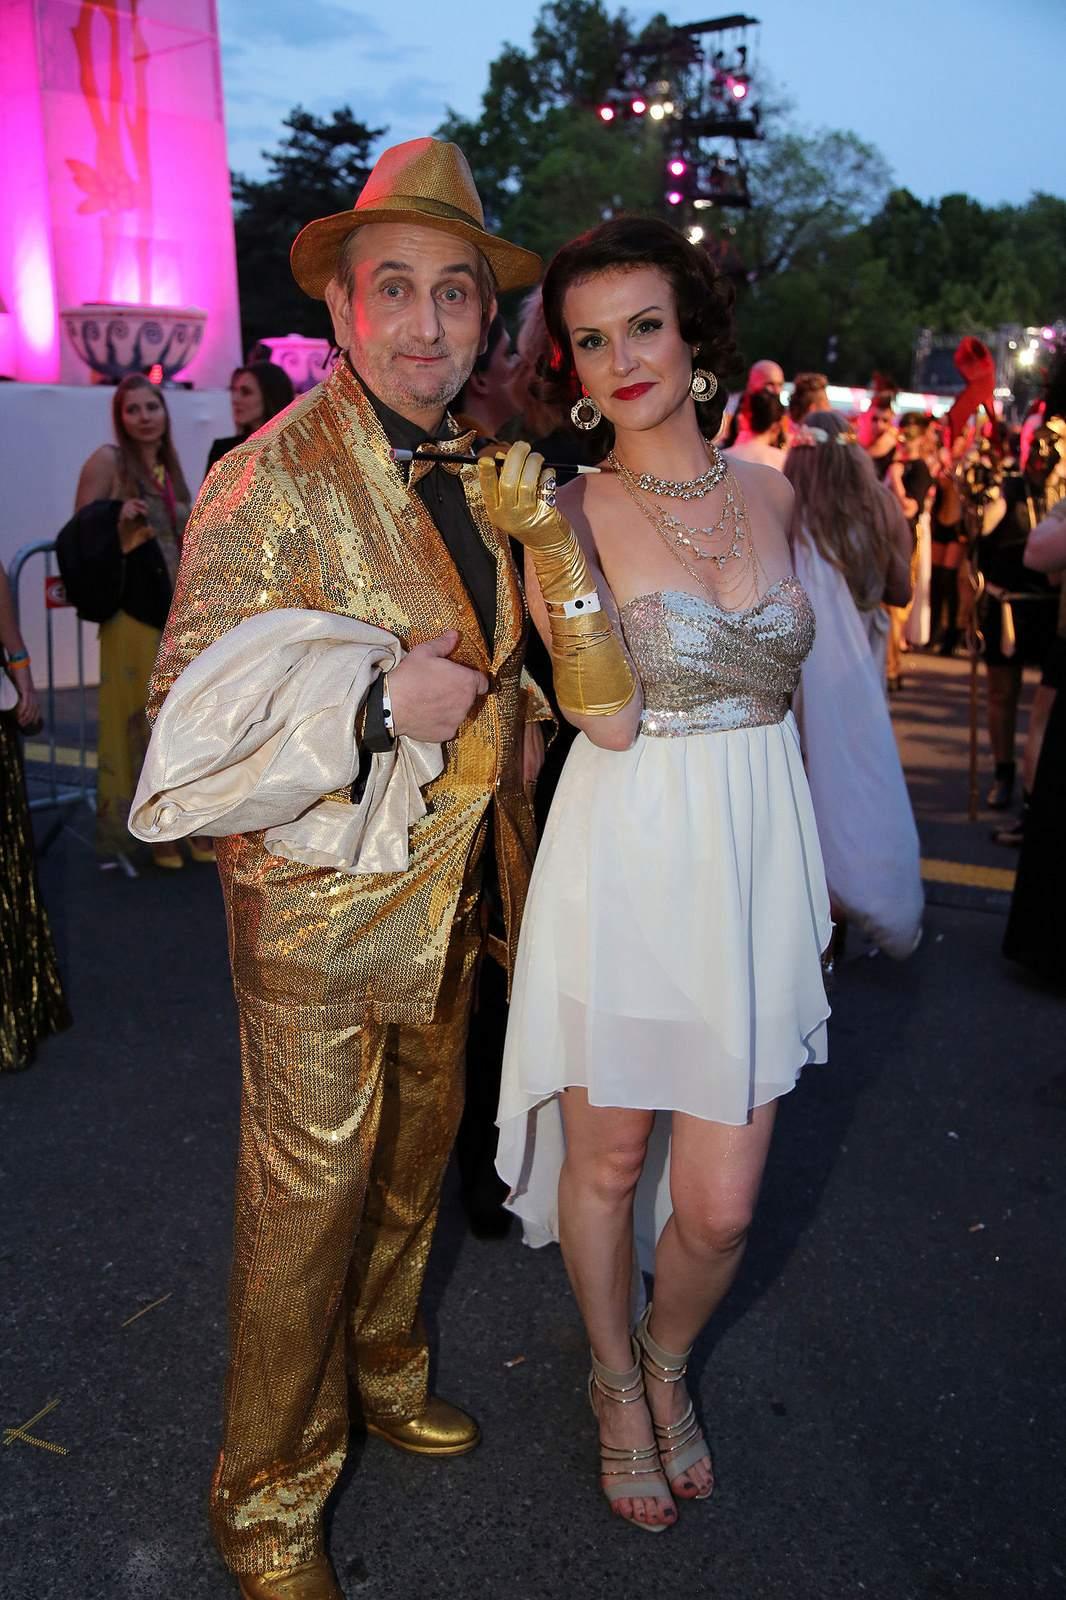 life ball8 Life Ball 2015 in Wien